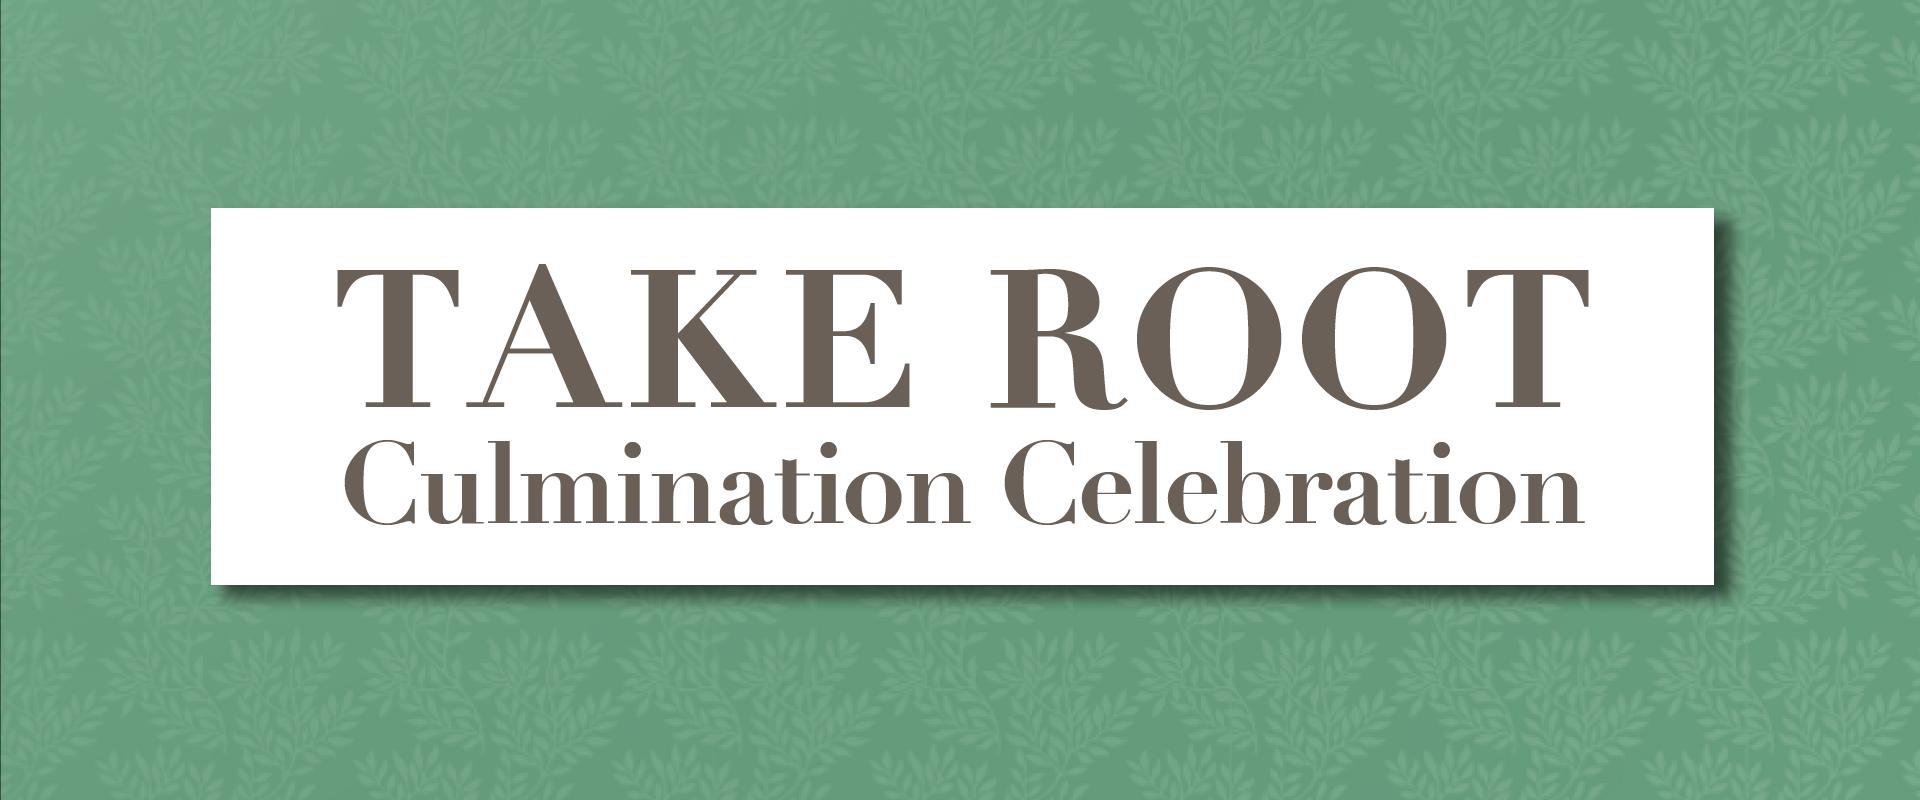 Take Root Culmination Celebration web main image.png